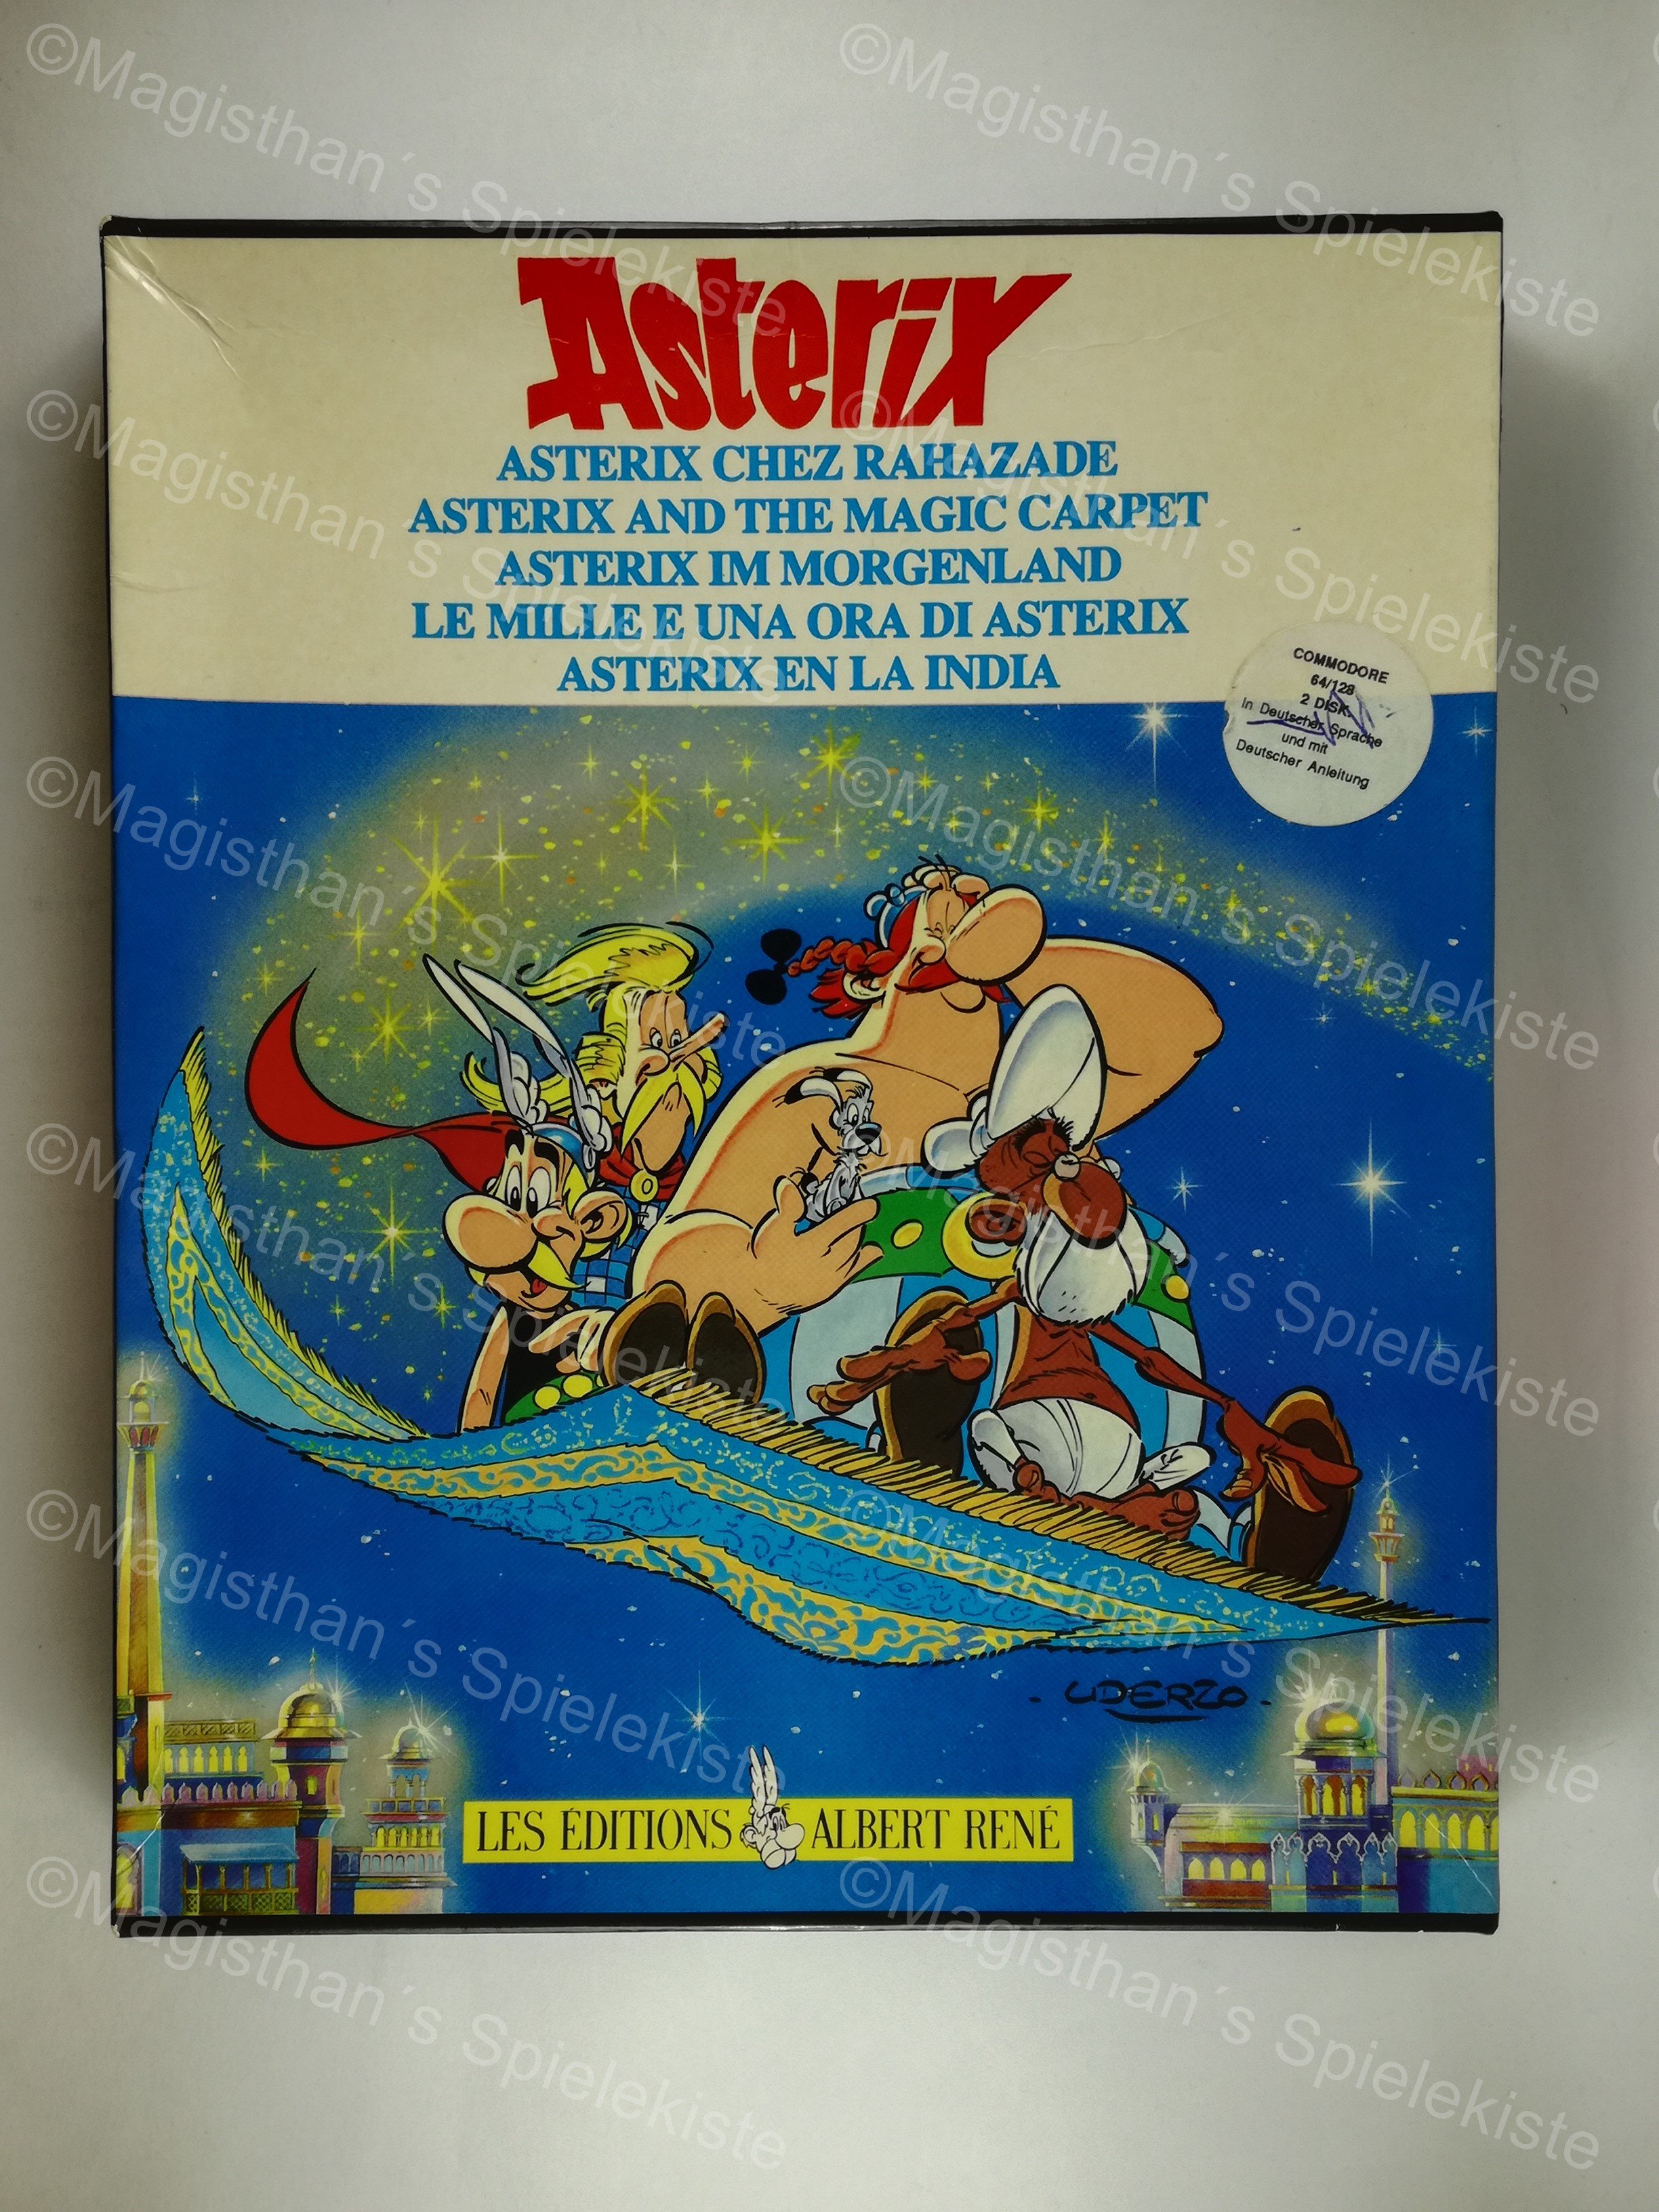 AsteriximMorgenlandC641.jpg